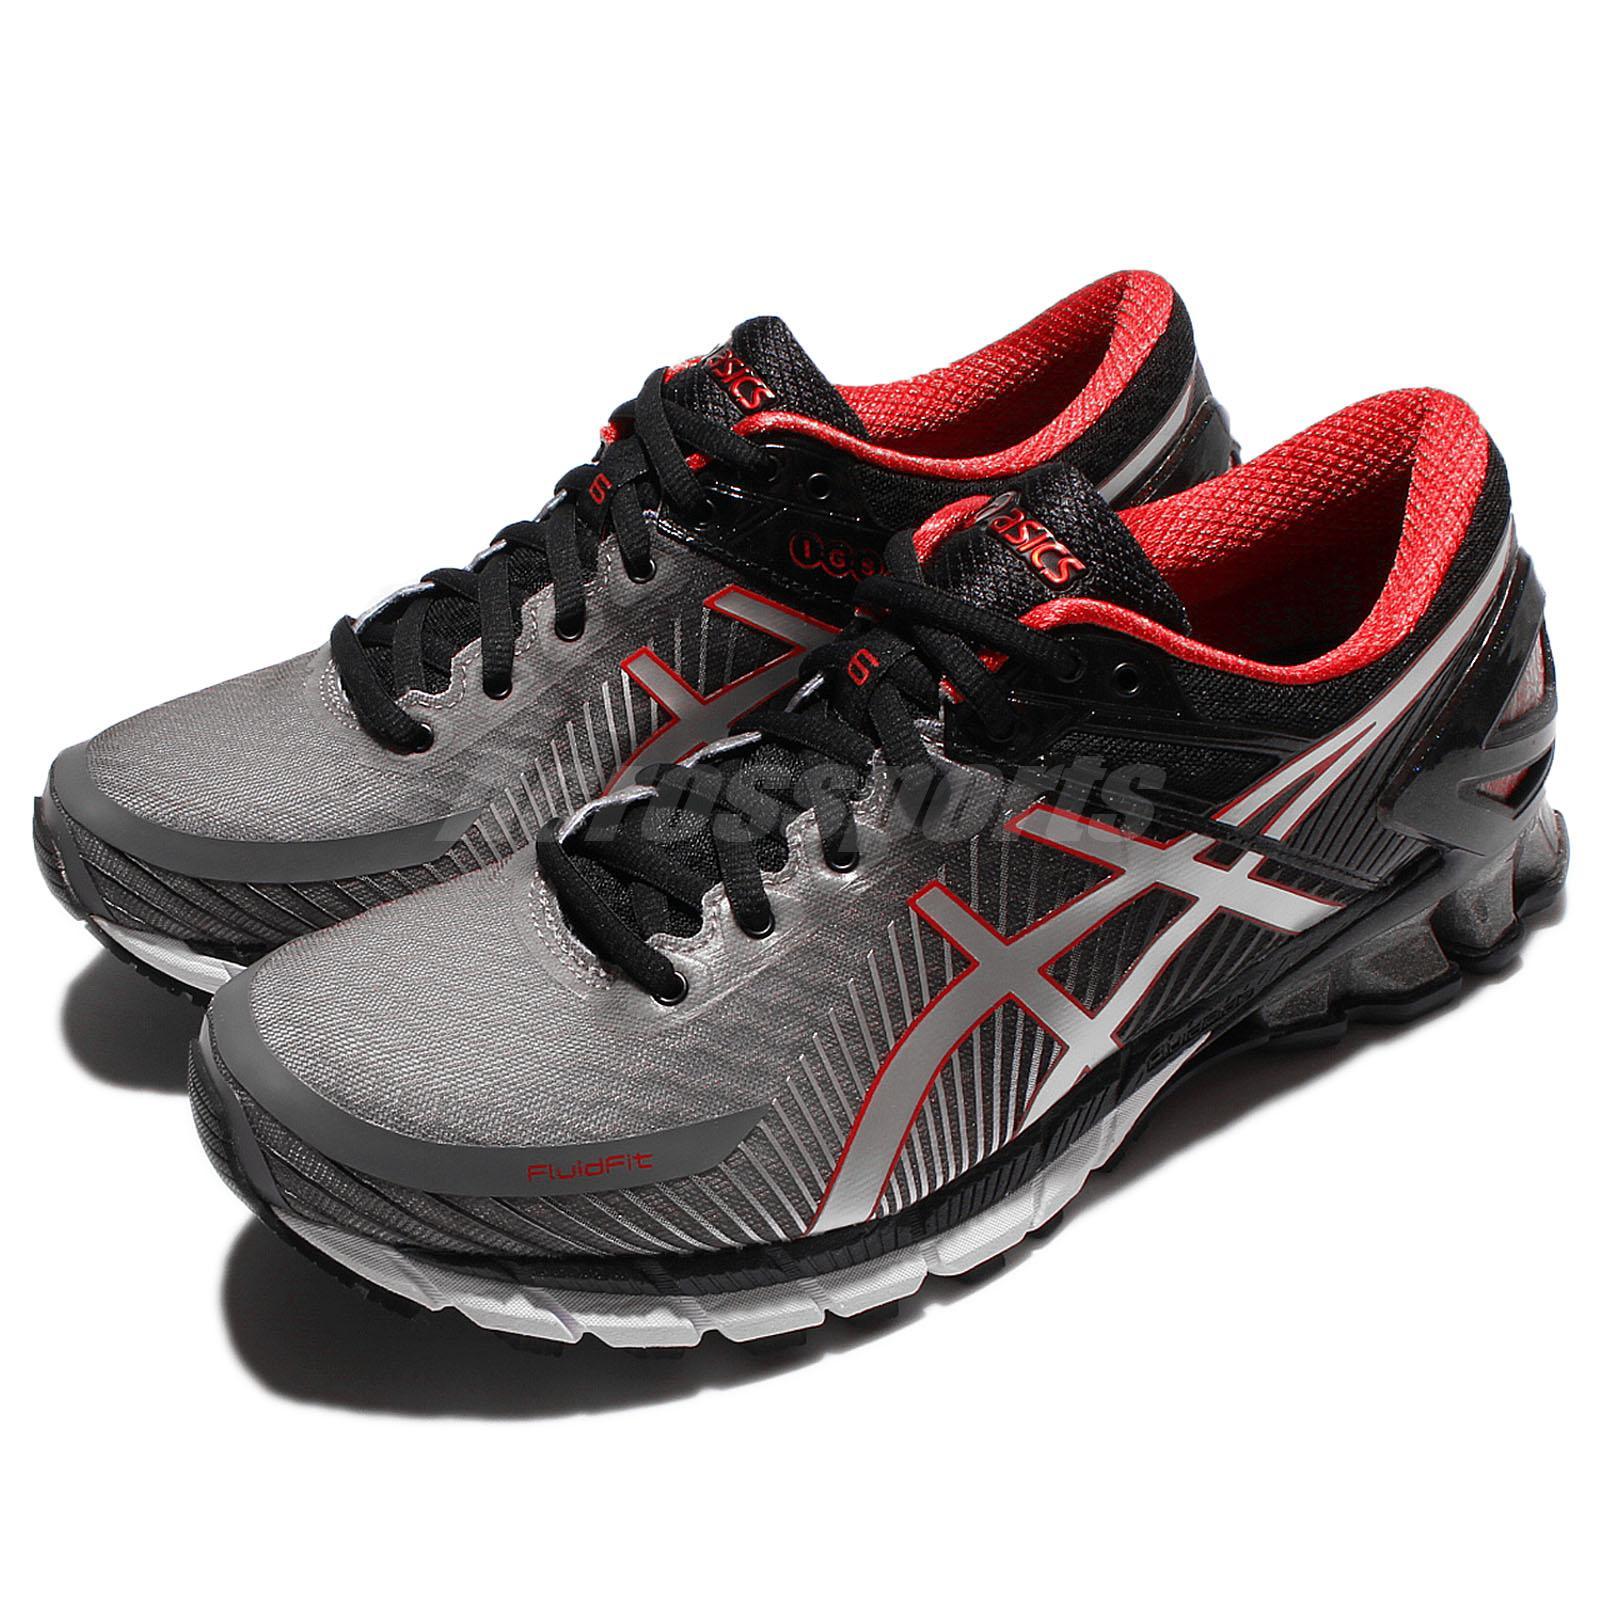 asics gel kinsei 6 vi black silver men running shoes sneaker trainers t644 n9793 ebay. Black Bedroom Furniture Sets. Home Design Ideas